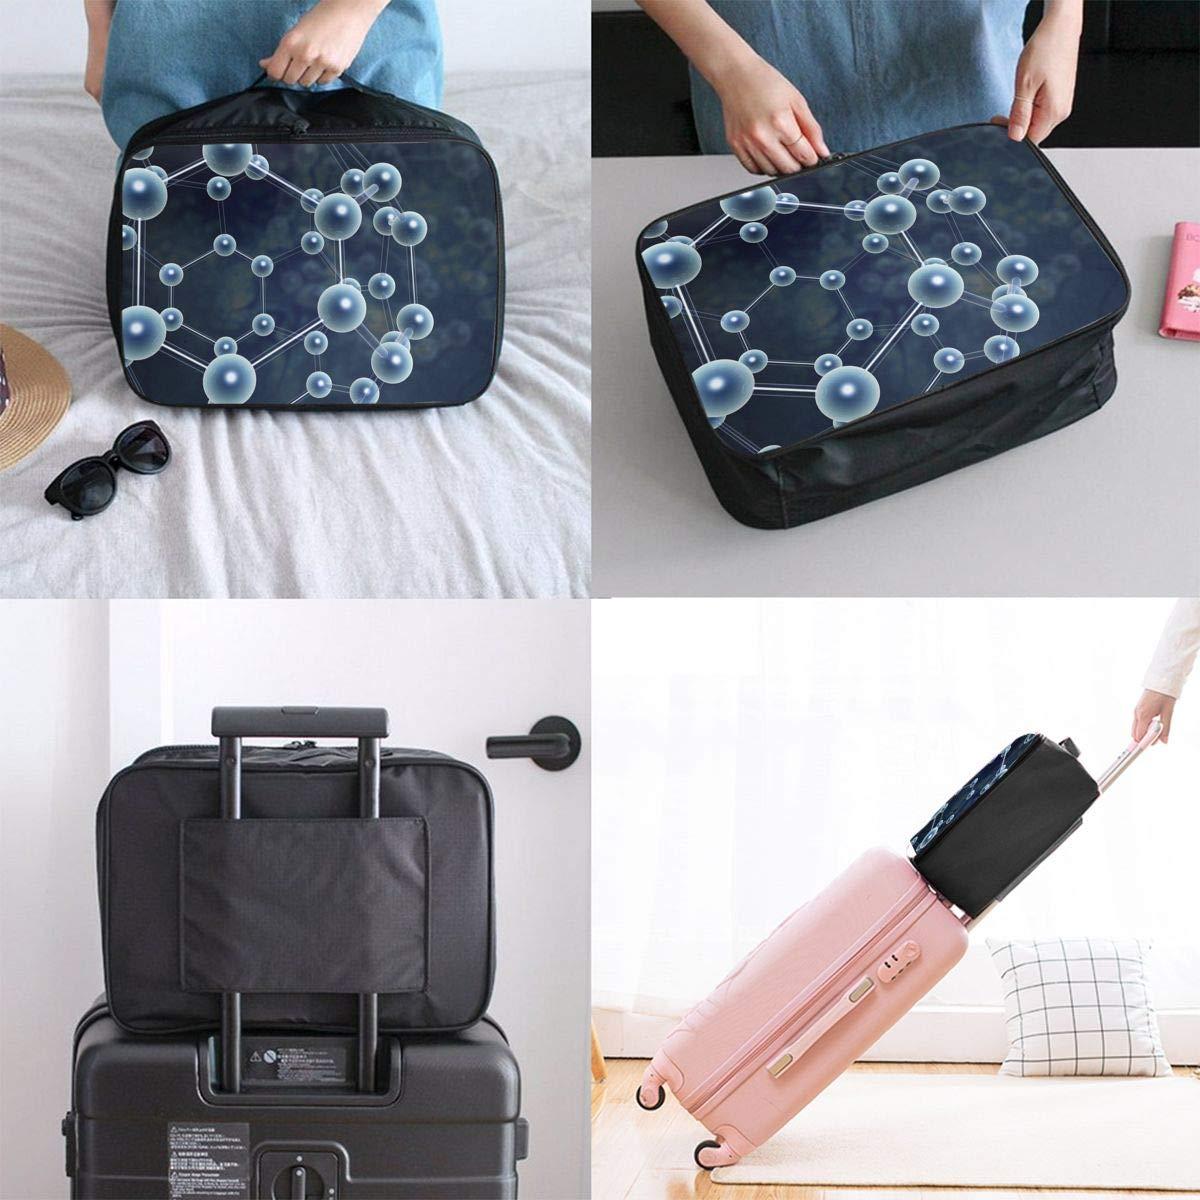 YueLJB Organic Chemistry Lightweight Large Capacity Portable Luggage Bag Travel Duffel Bag Storage Carry Luggage Duffle Tote Bag